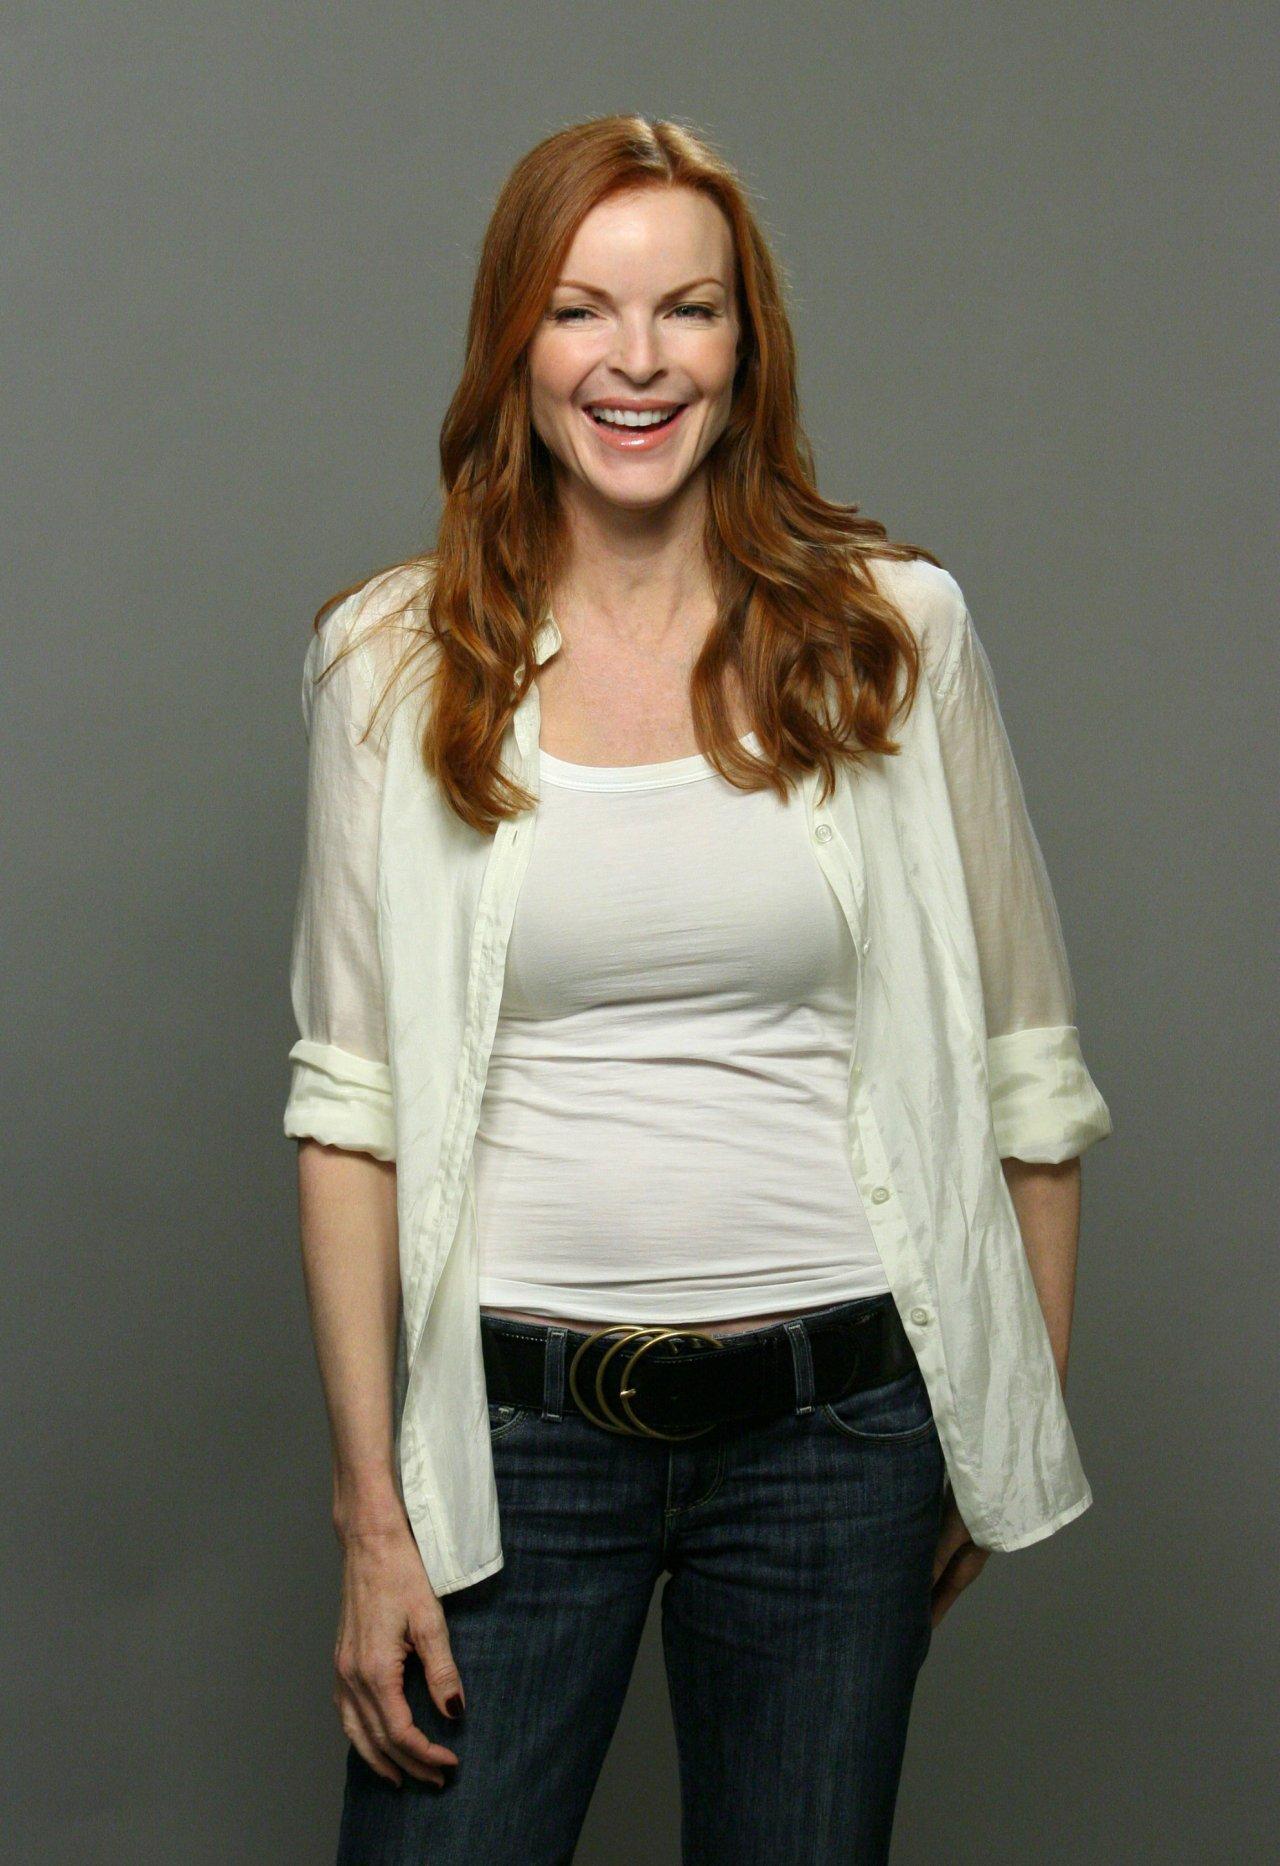 Марсия кросс беременна